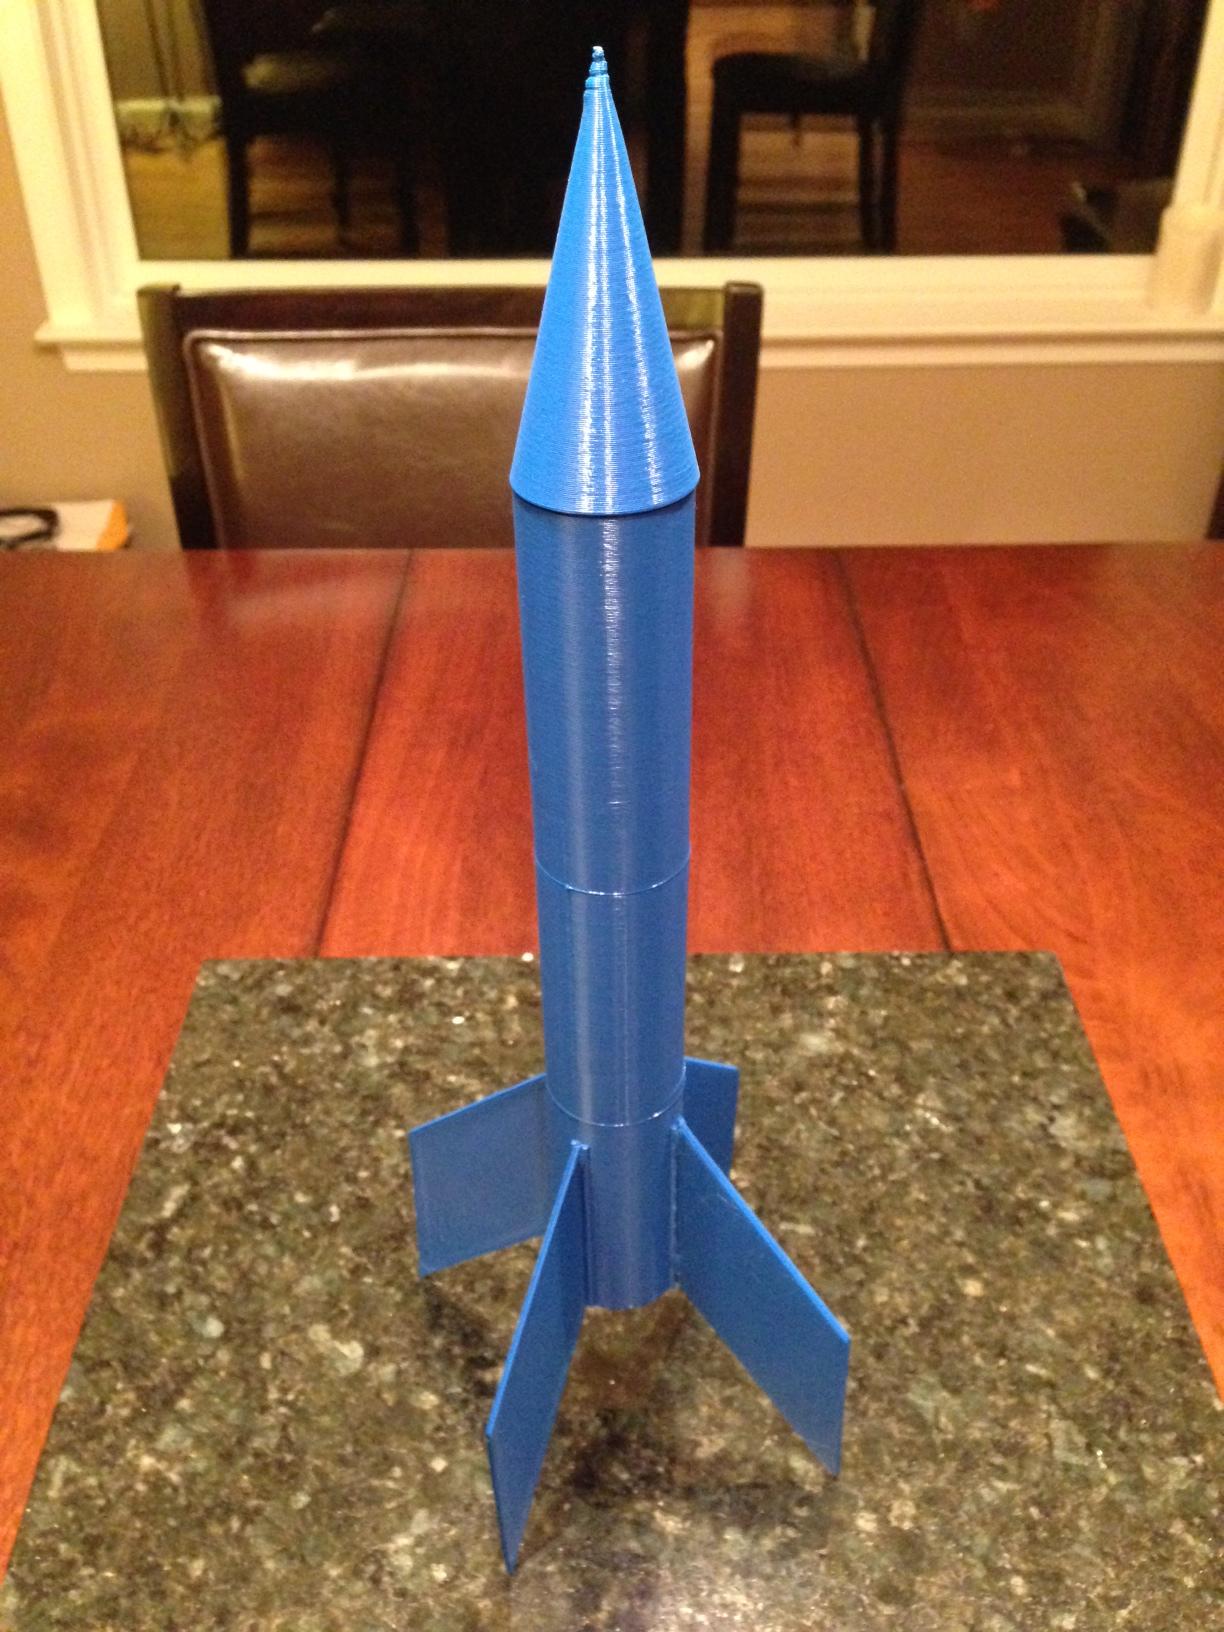 3D Printed Rocket Assembled